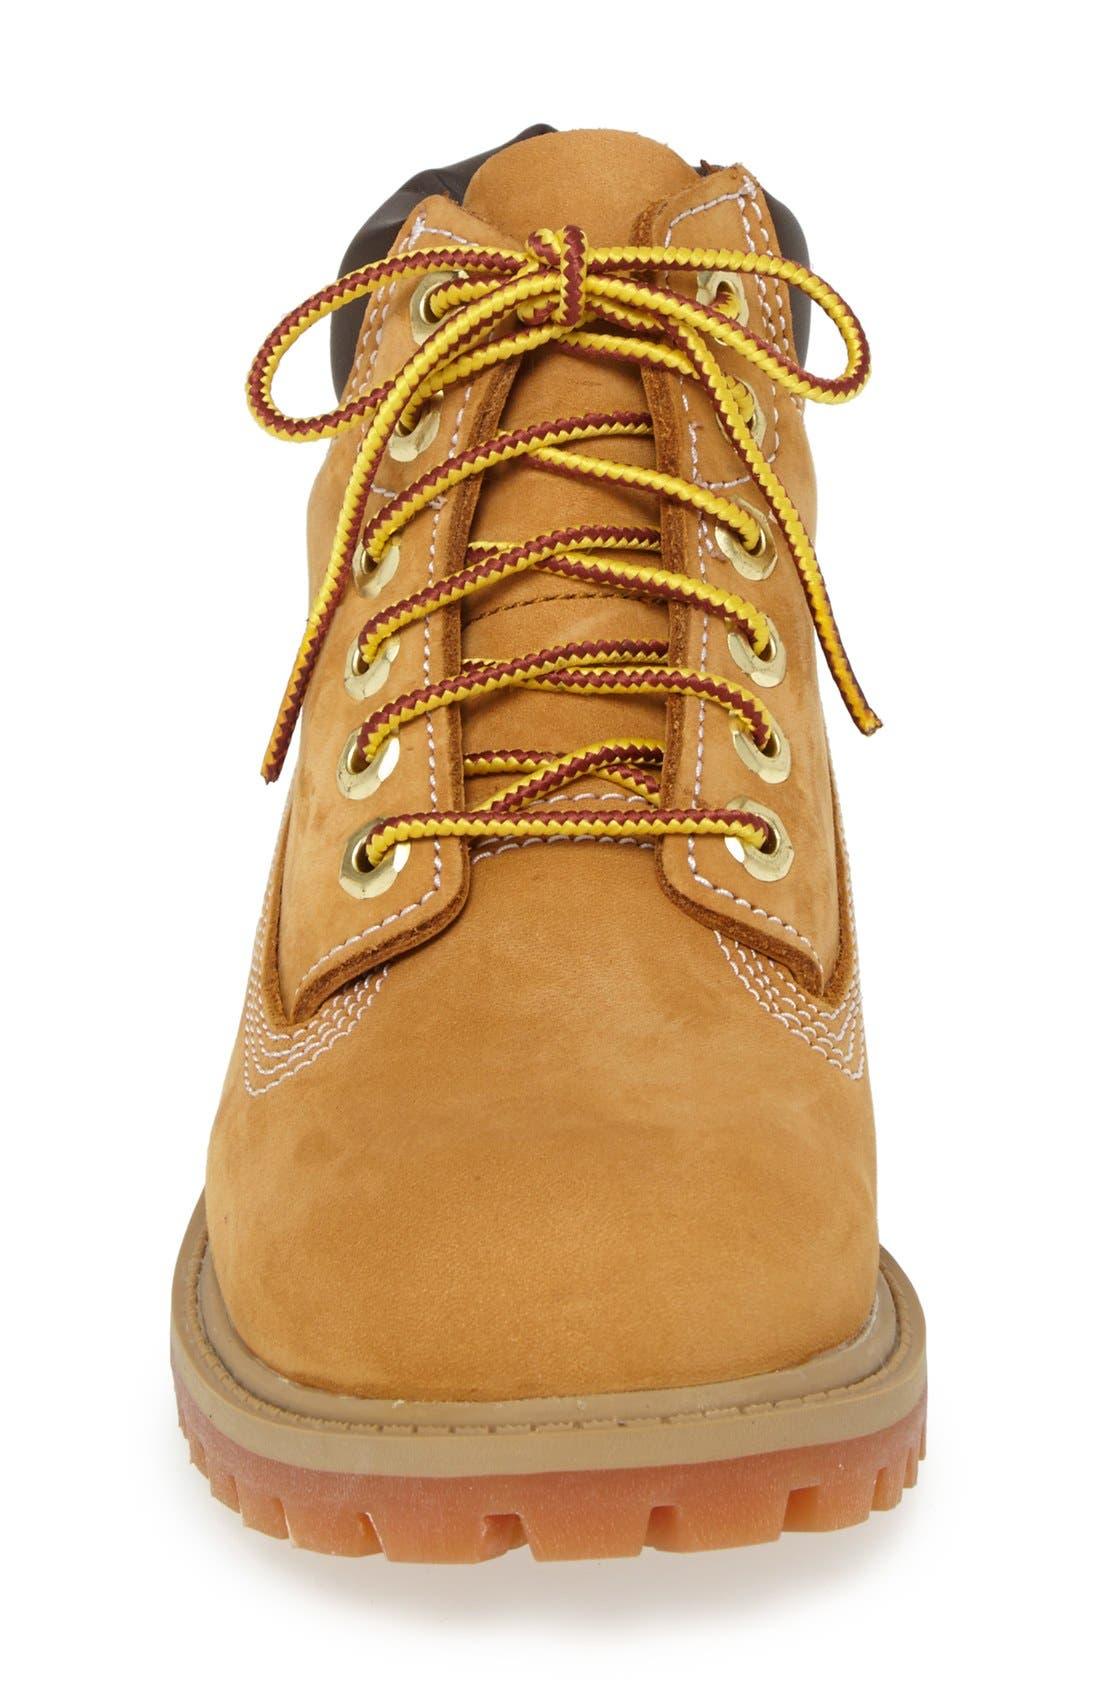 Alternate Image 3  - Timberland '6 Premium' Waterproof Leather Boot (Walker & Toddler)